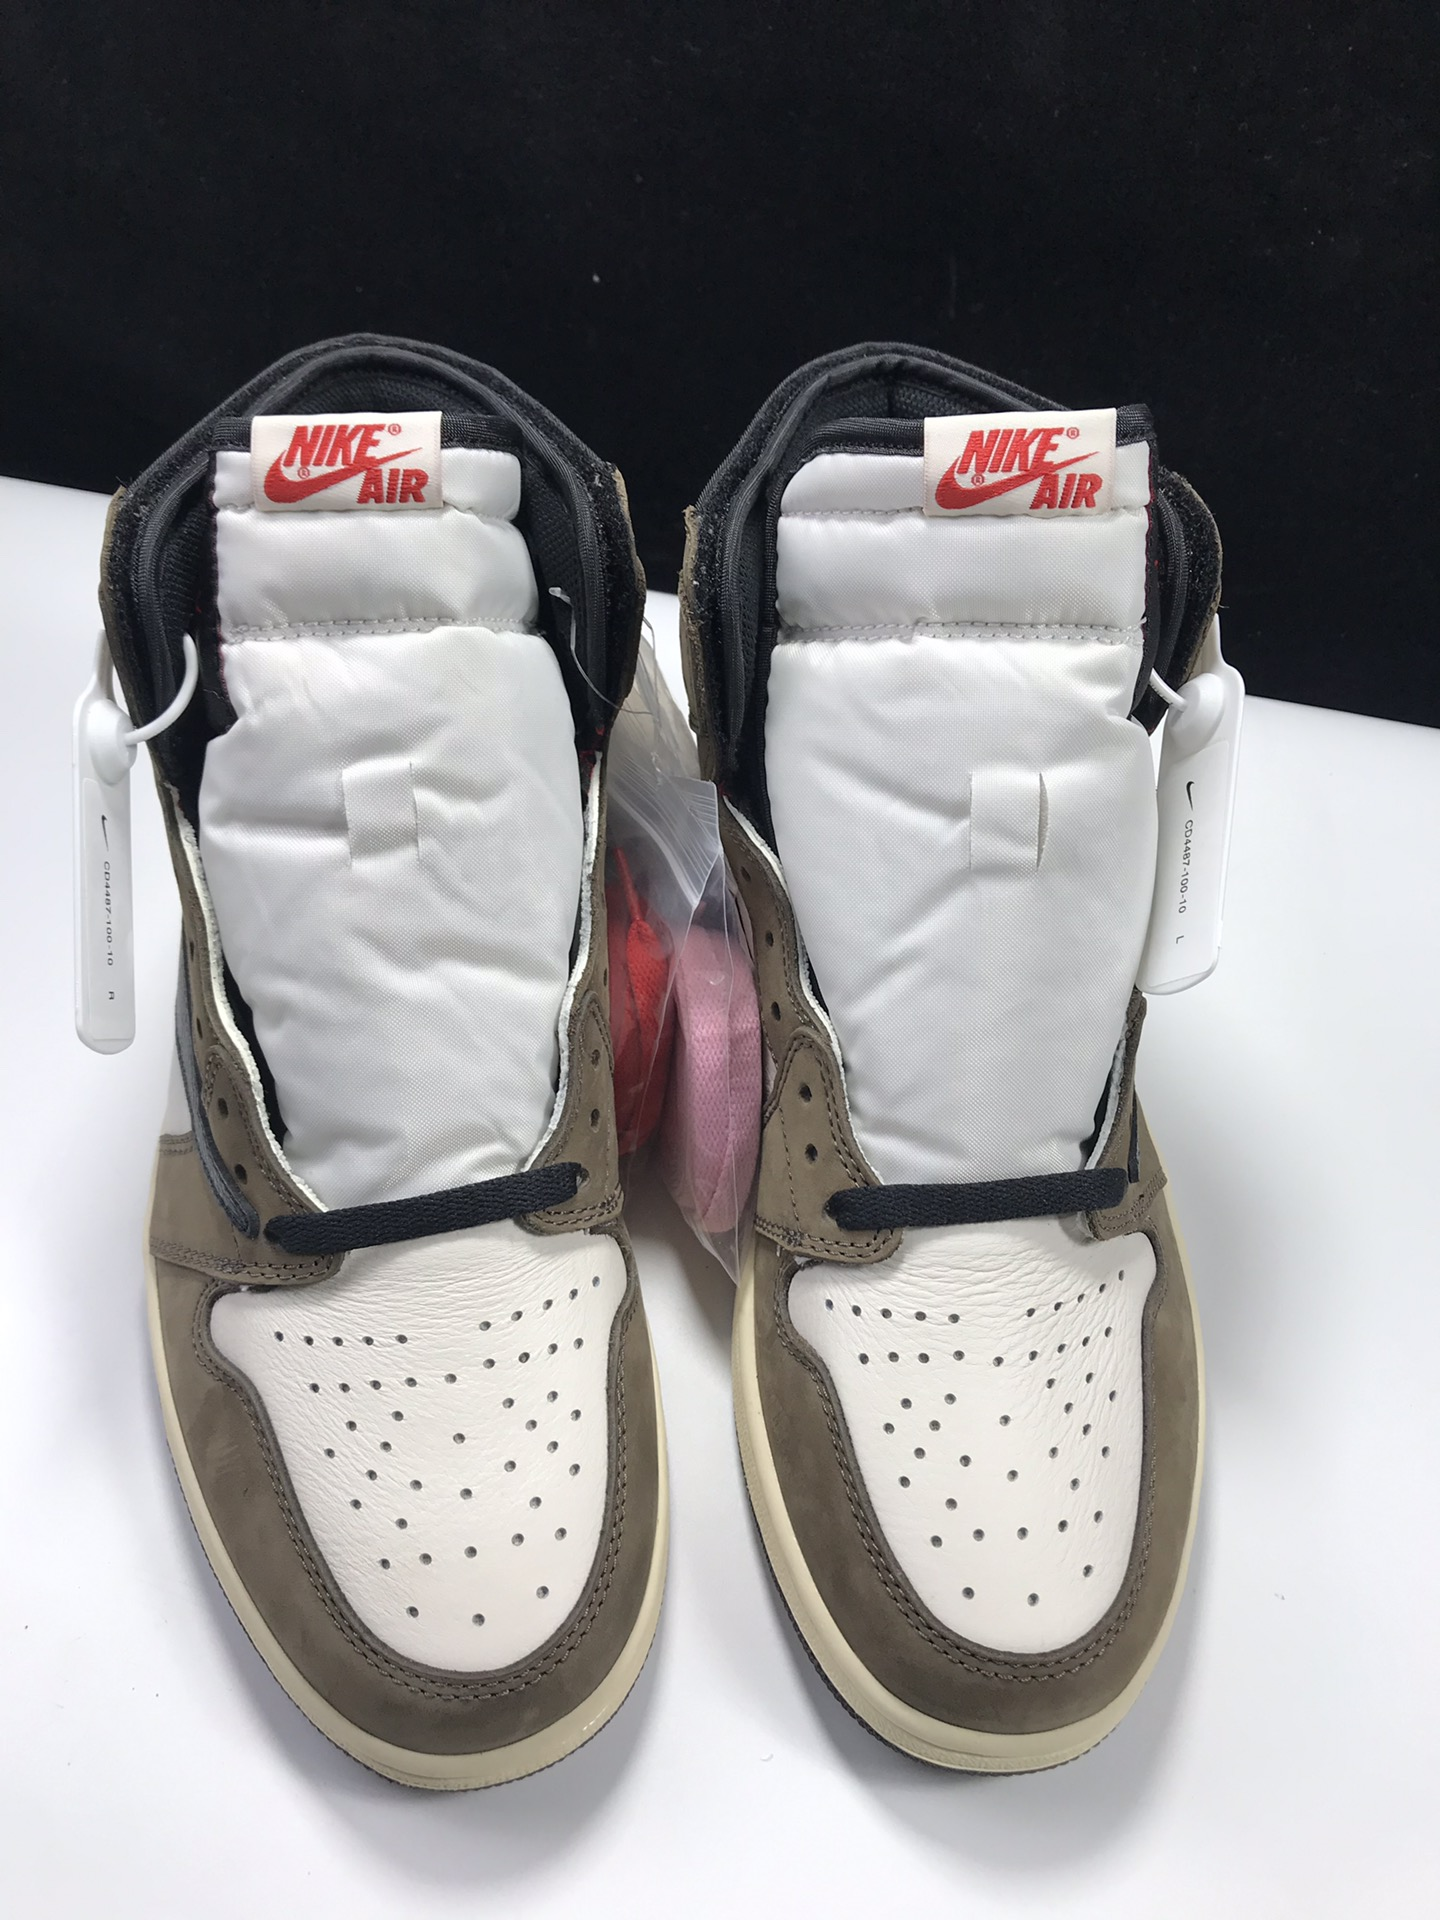 S2版:AJ1倒钩高帮   莞产 Air Jordan 1 RETRO HI OG,货号:CD4487-100_莆田ljr工厂联系方式